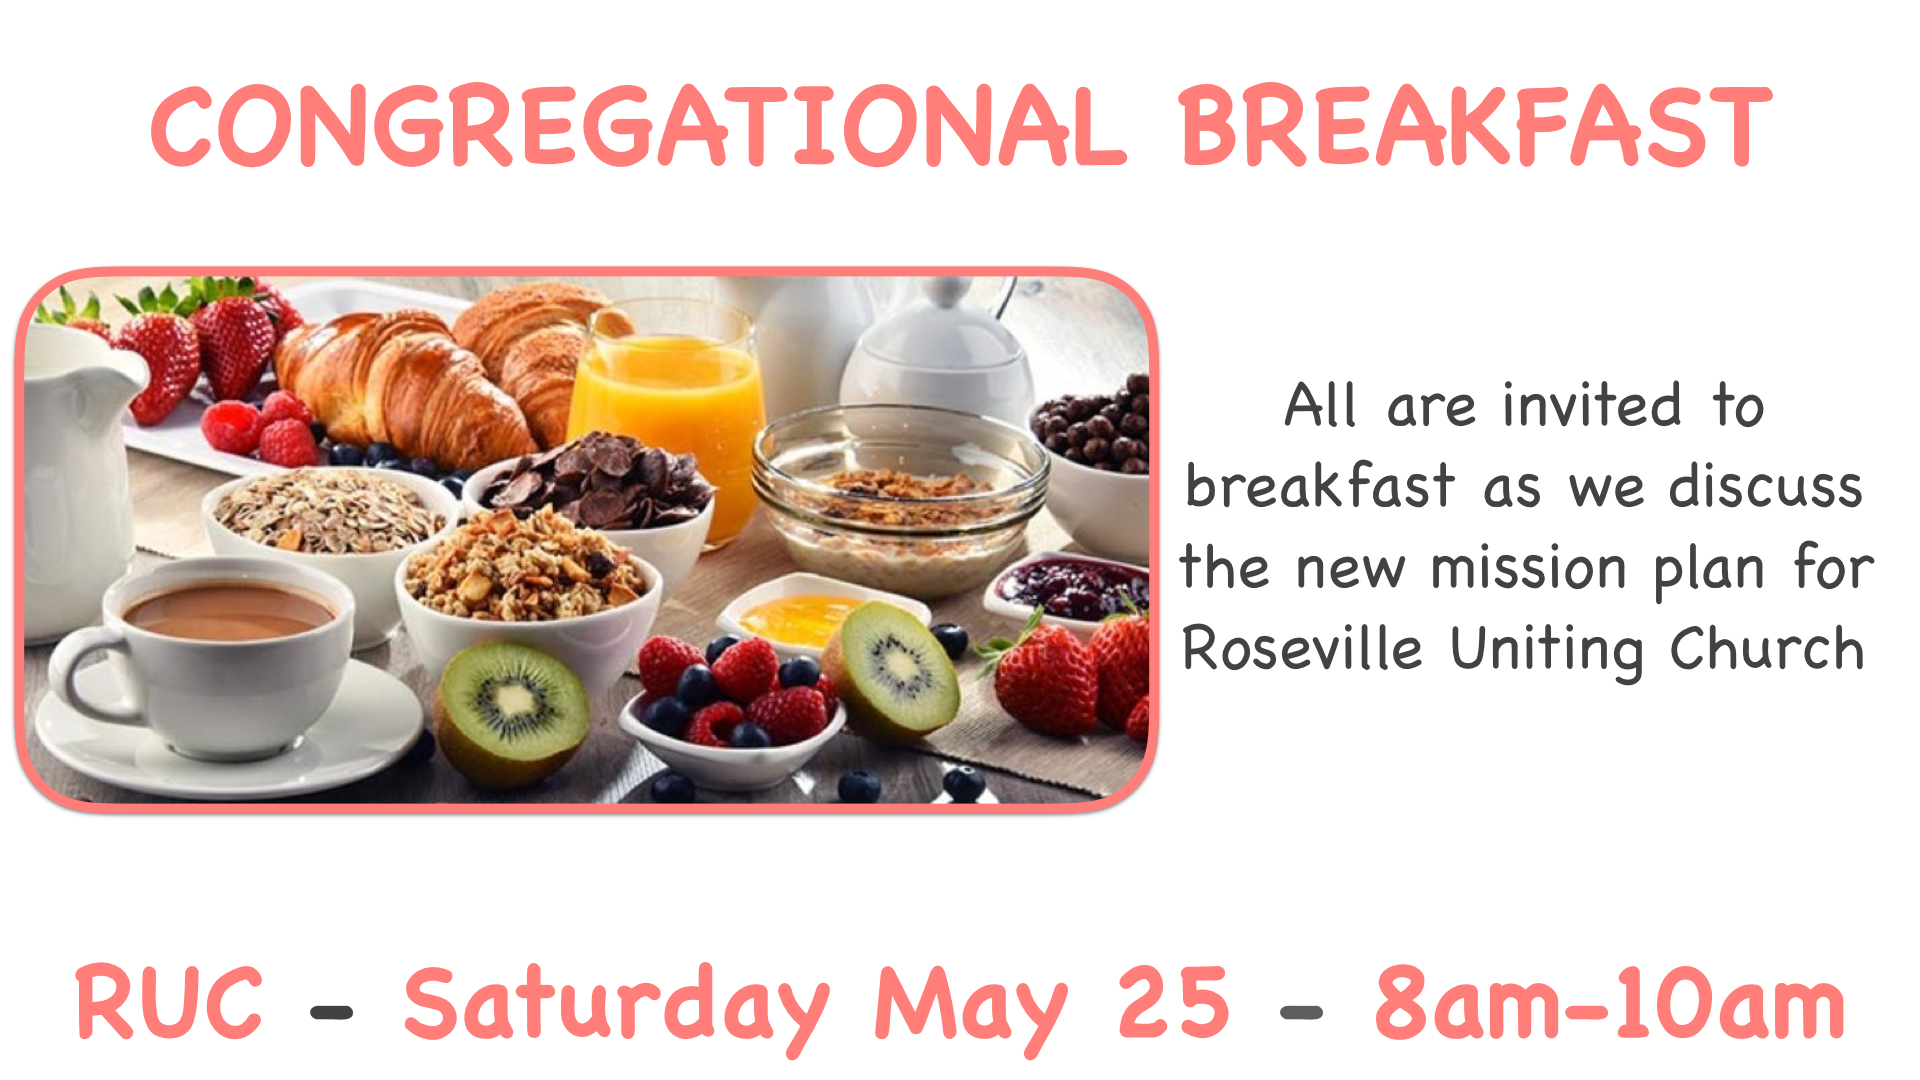 Congregational Breakfast